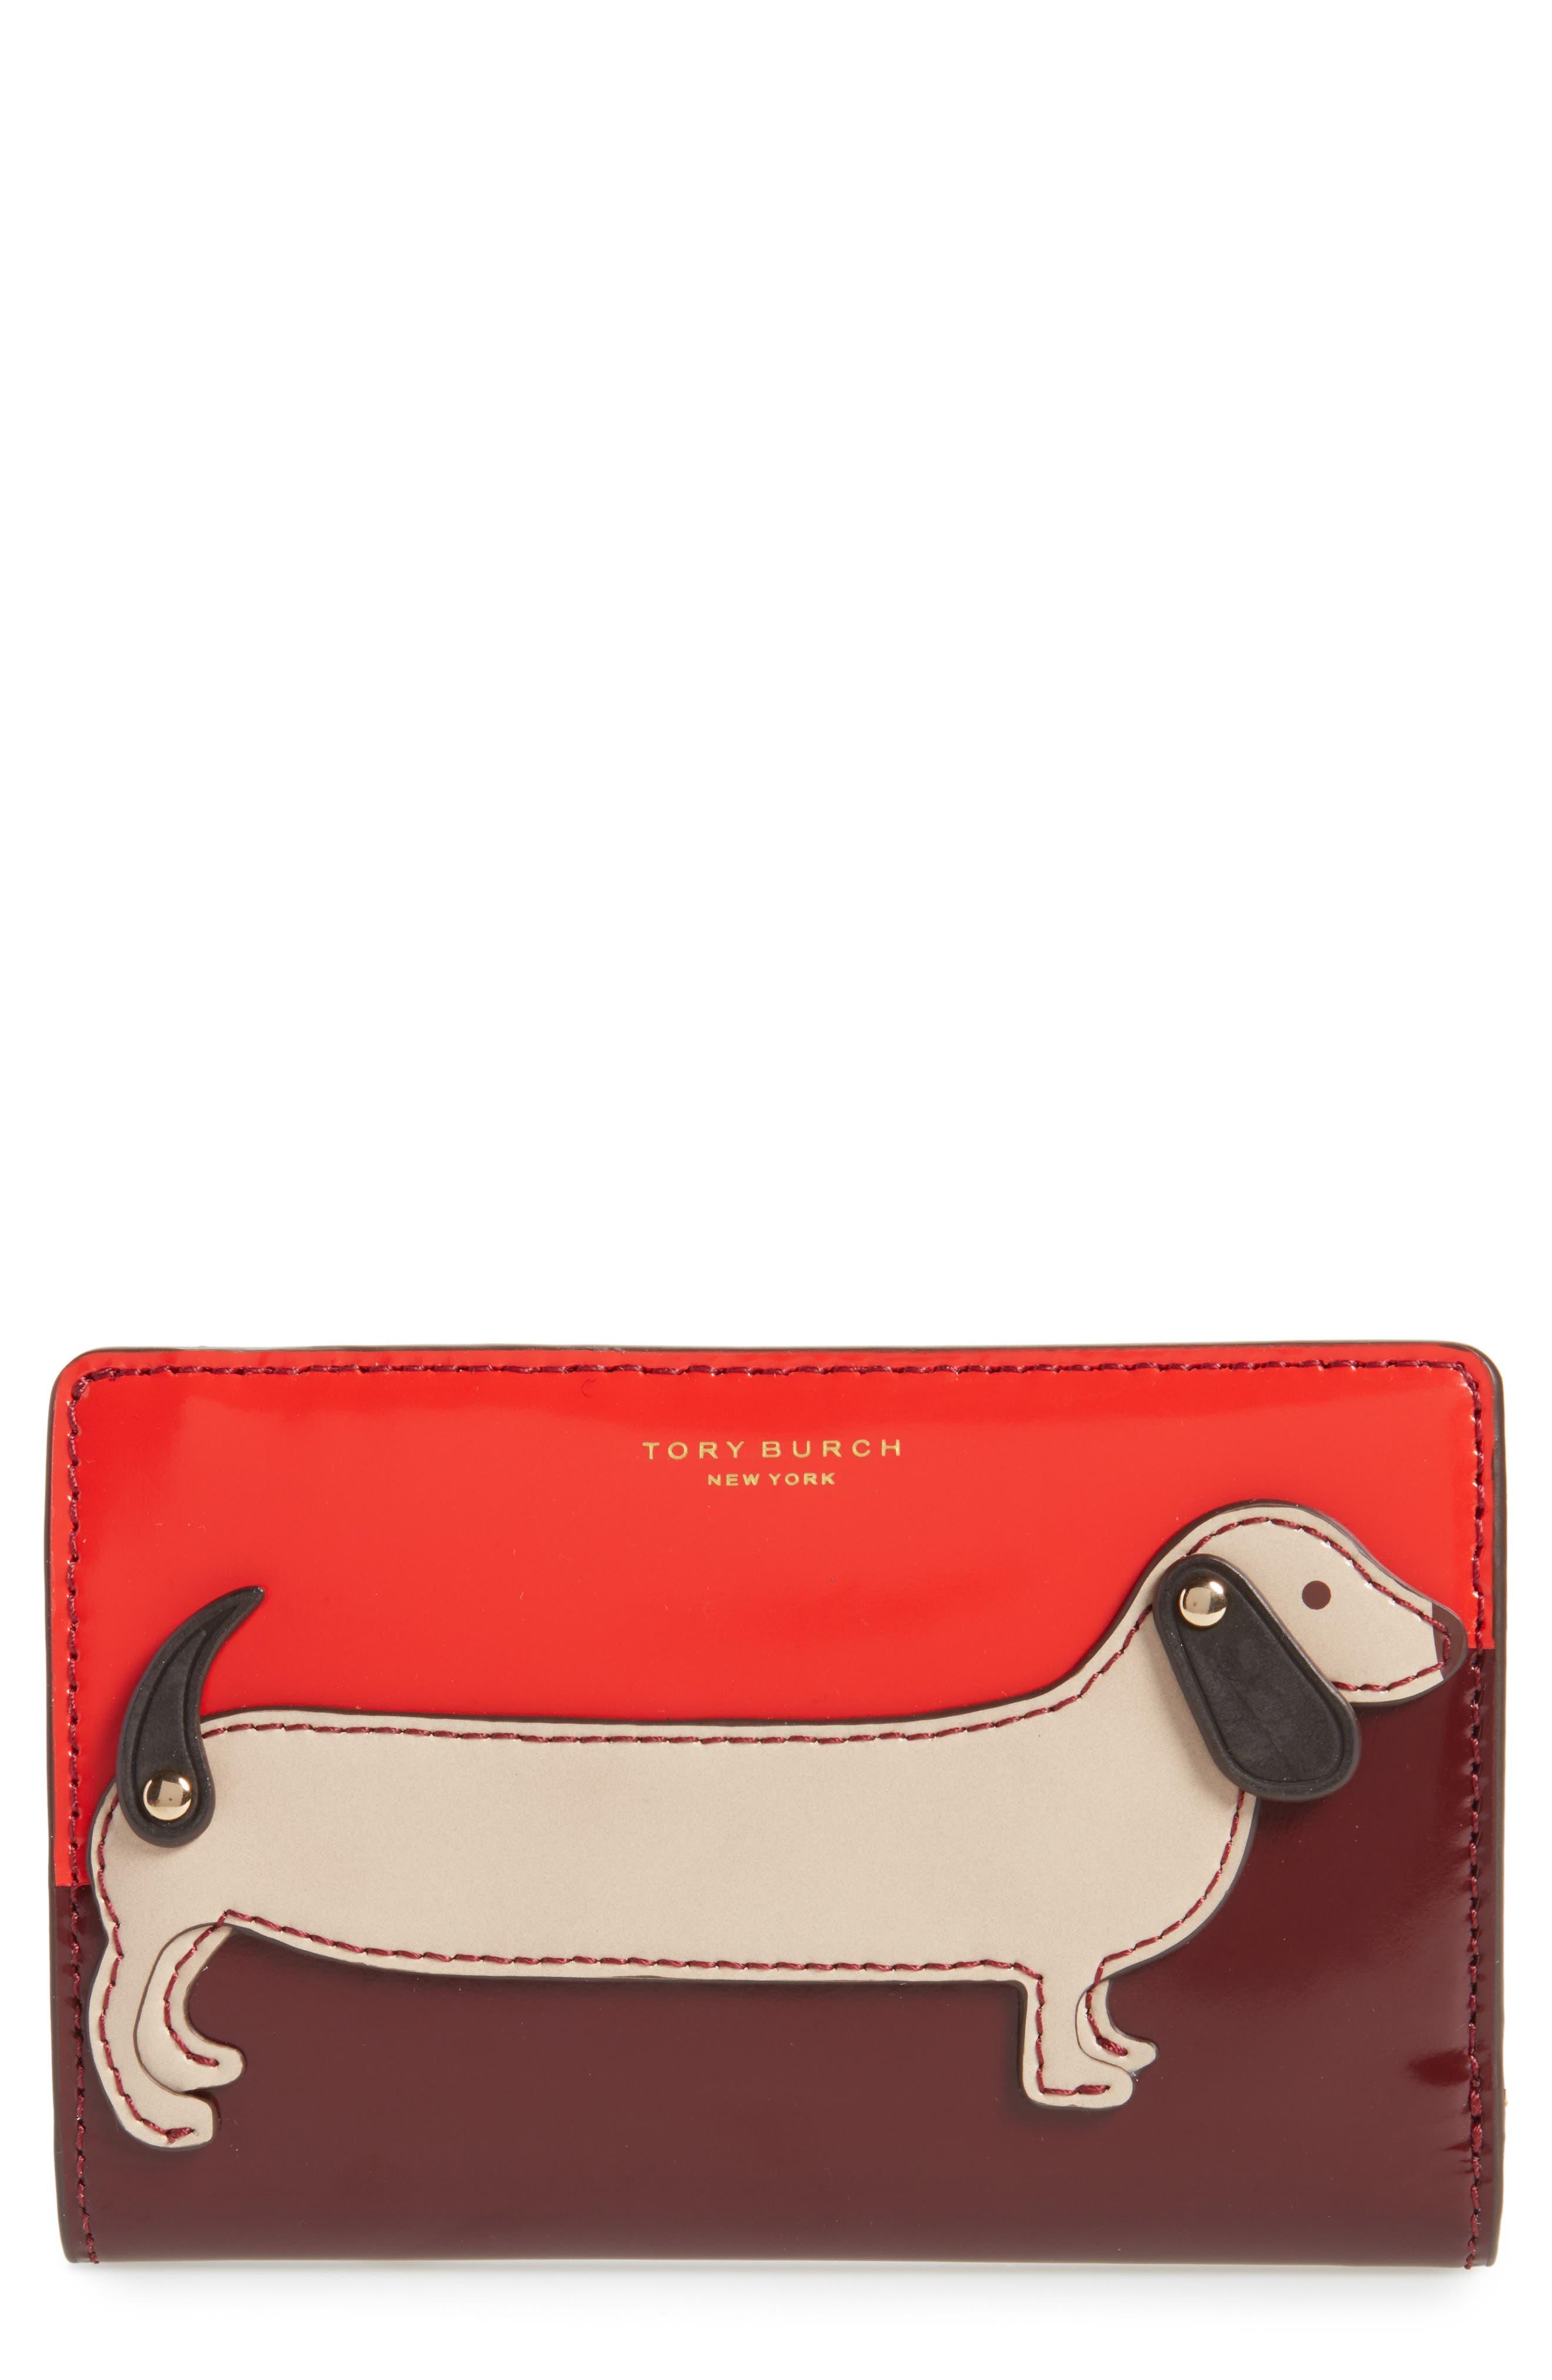 Medium McGraw Dachshund Slim Leather Wallet,                             Main thumbnail 1, color,                             600